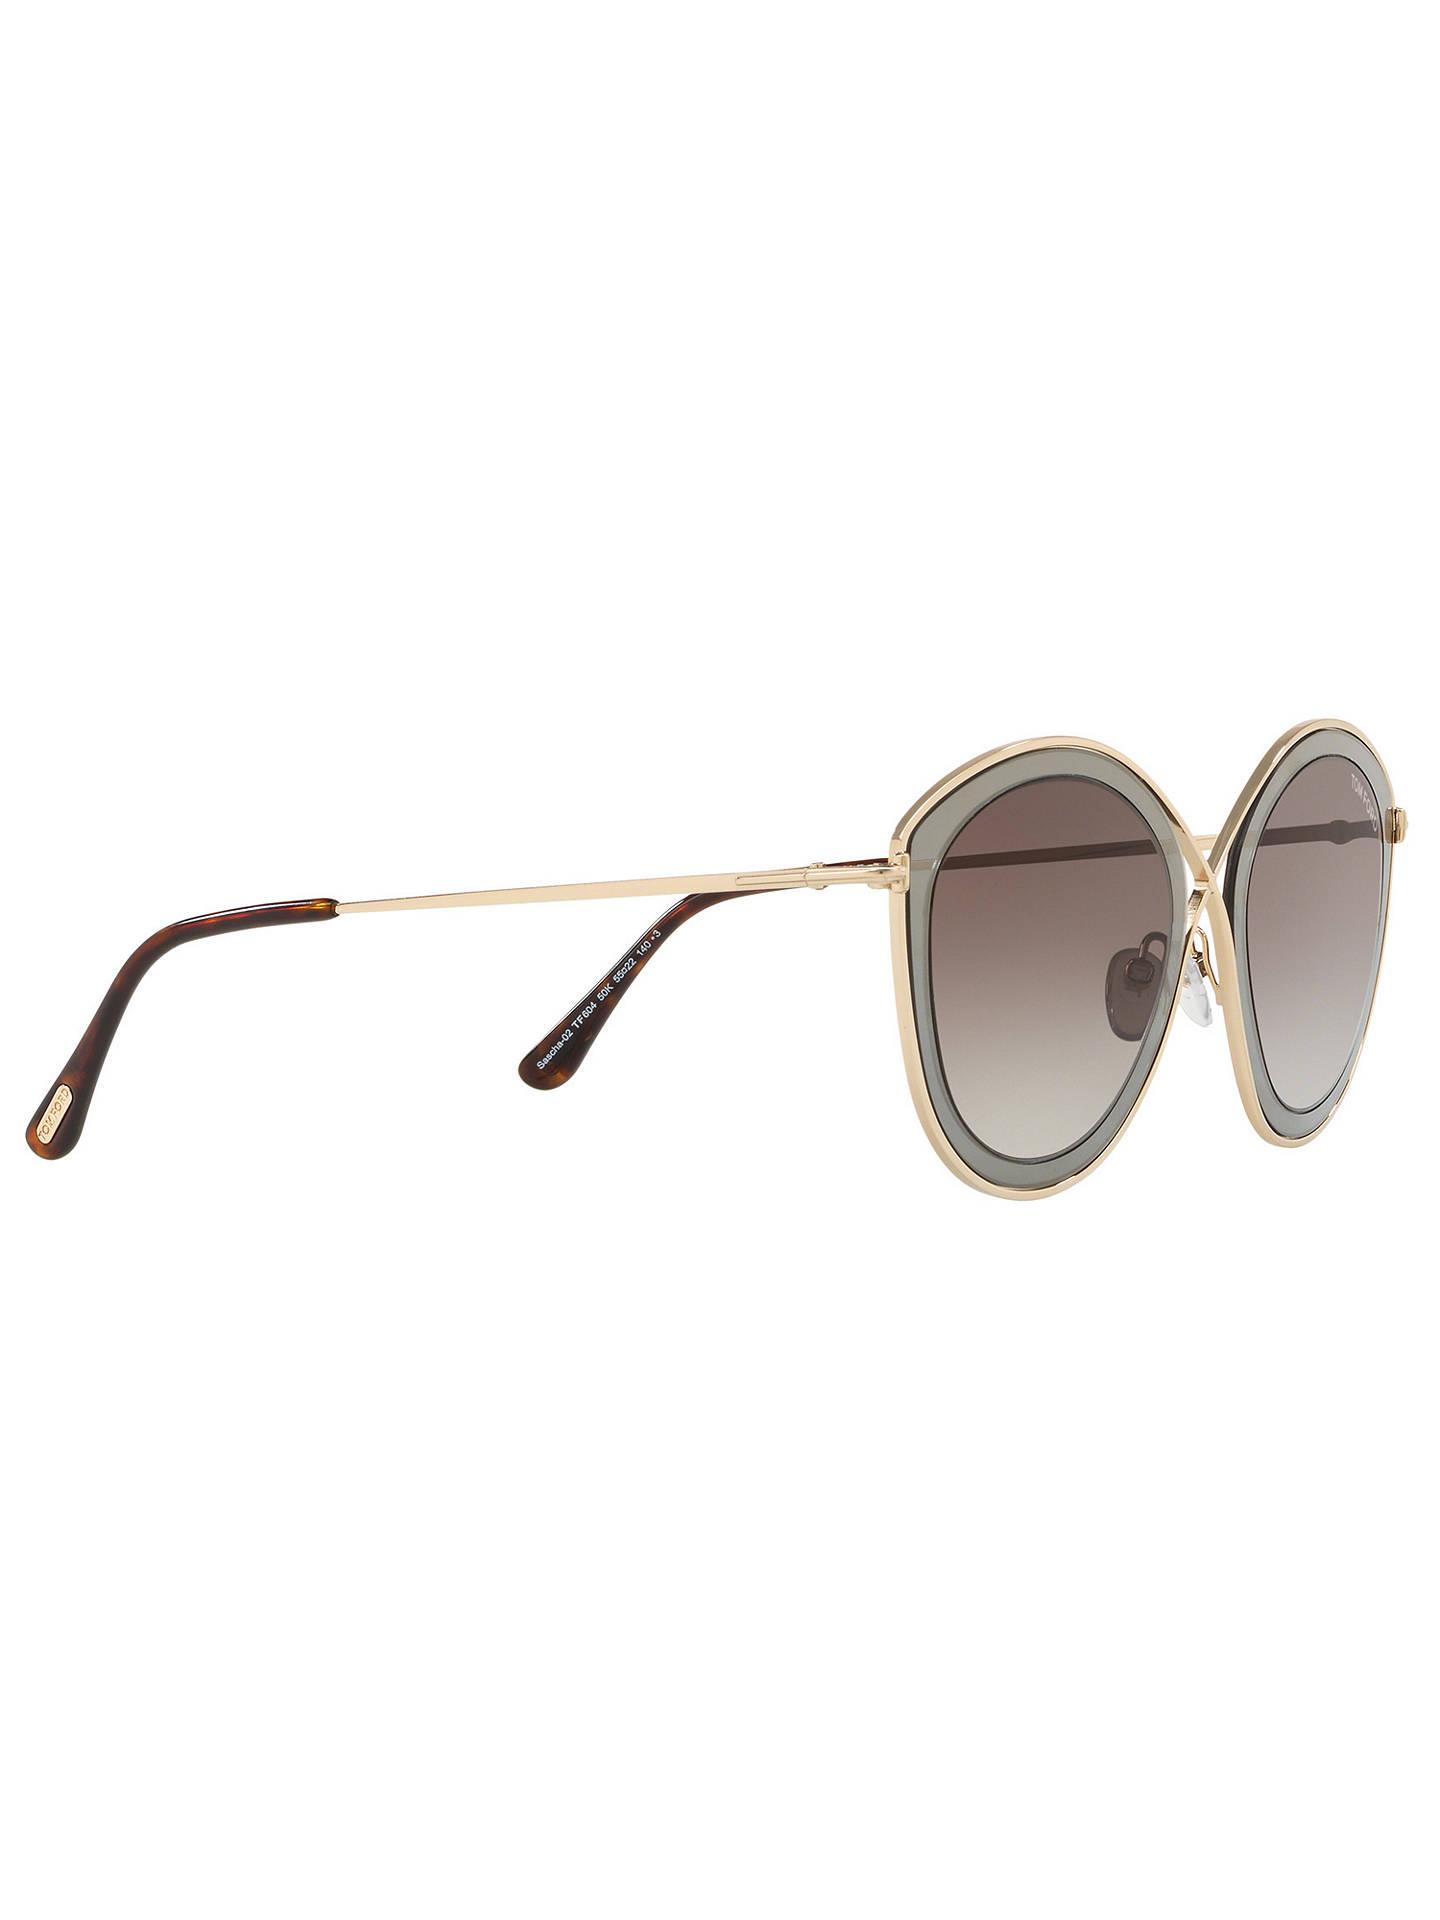 Sascha Cat's Women's Gradient Tom Ft0604 Eye SunglassesGoldbrown Ford hQdCxtsr